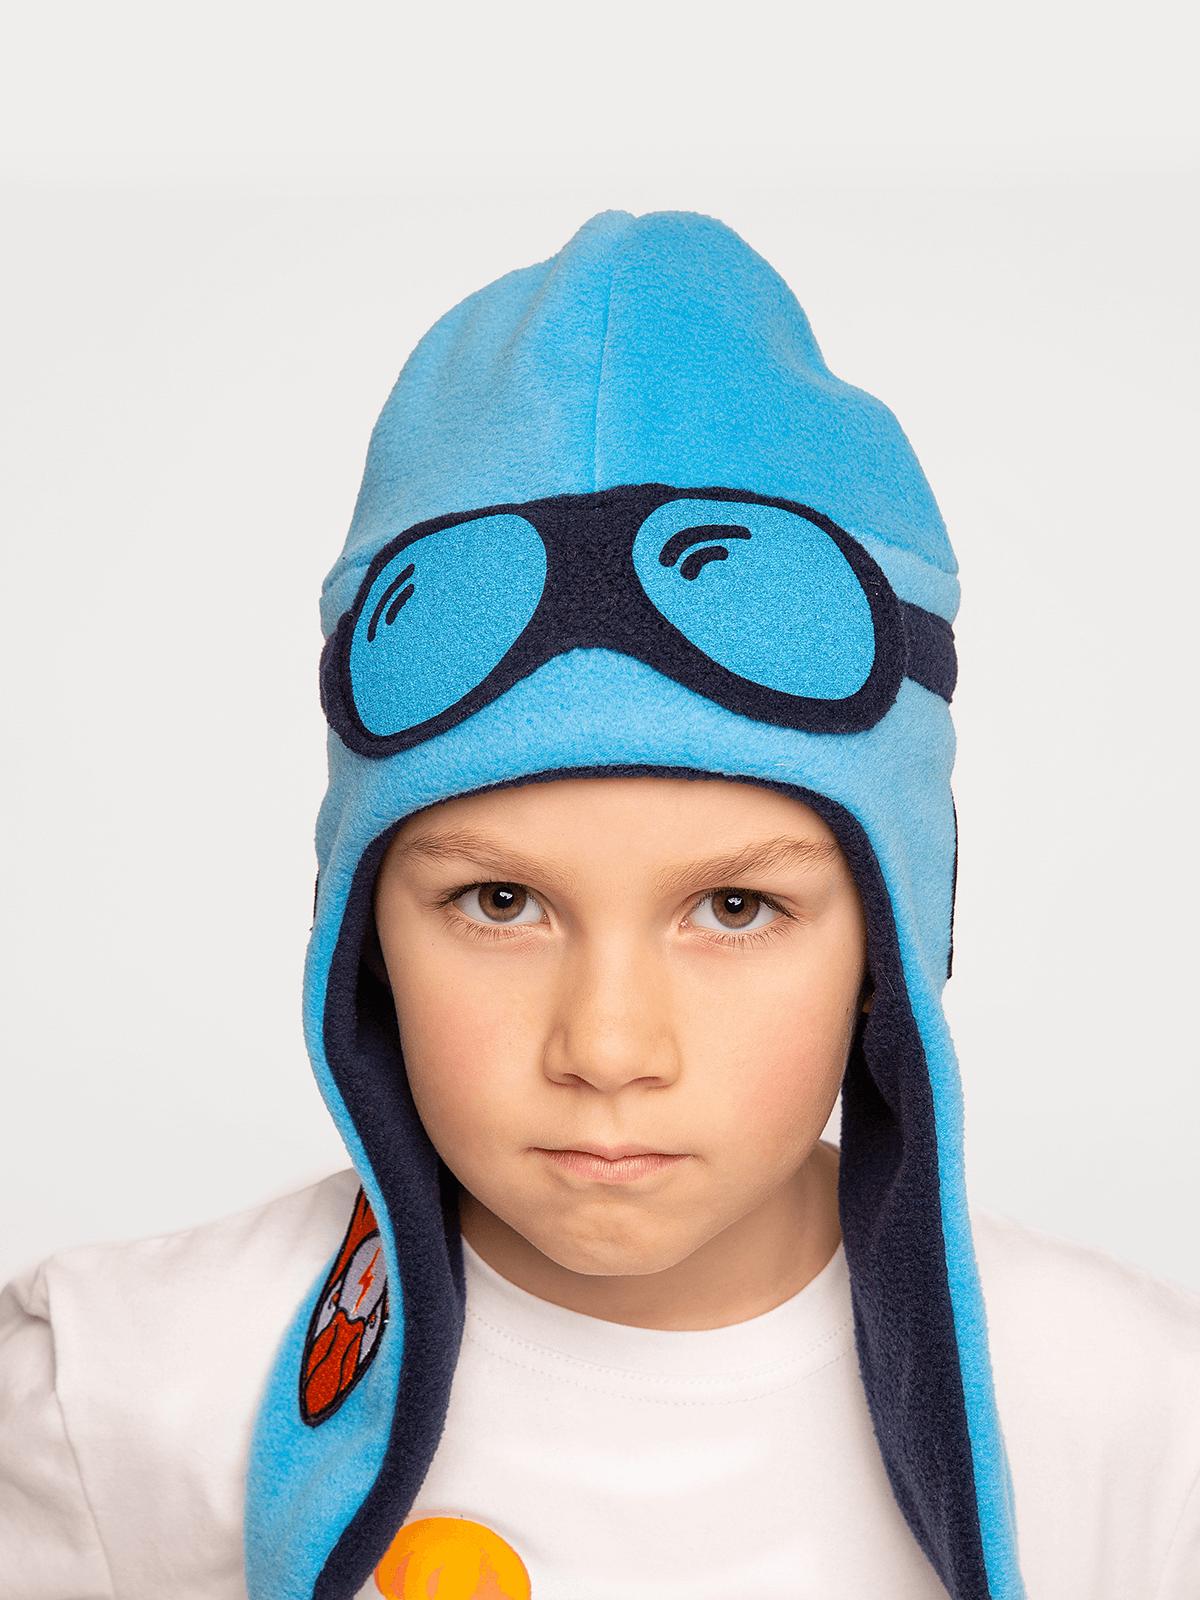 Kids Hat Pilot. Color sky blue.  Material: polyester.